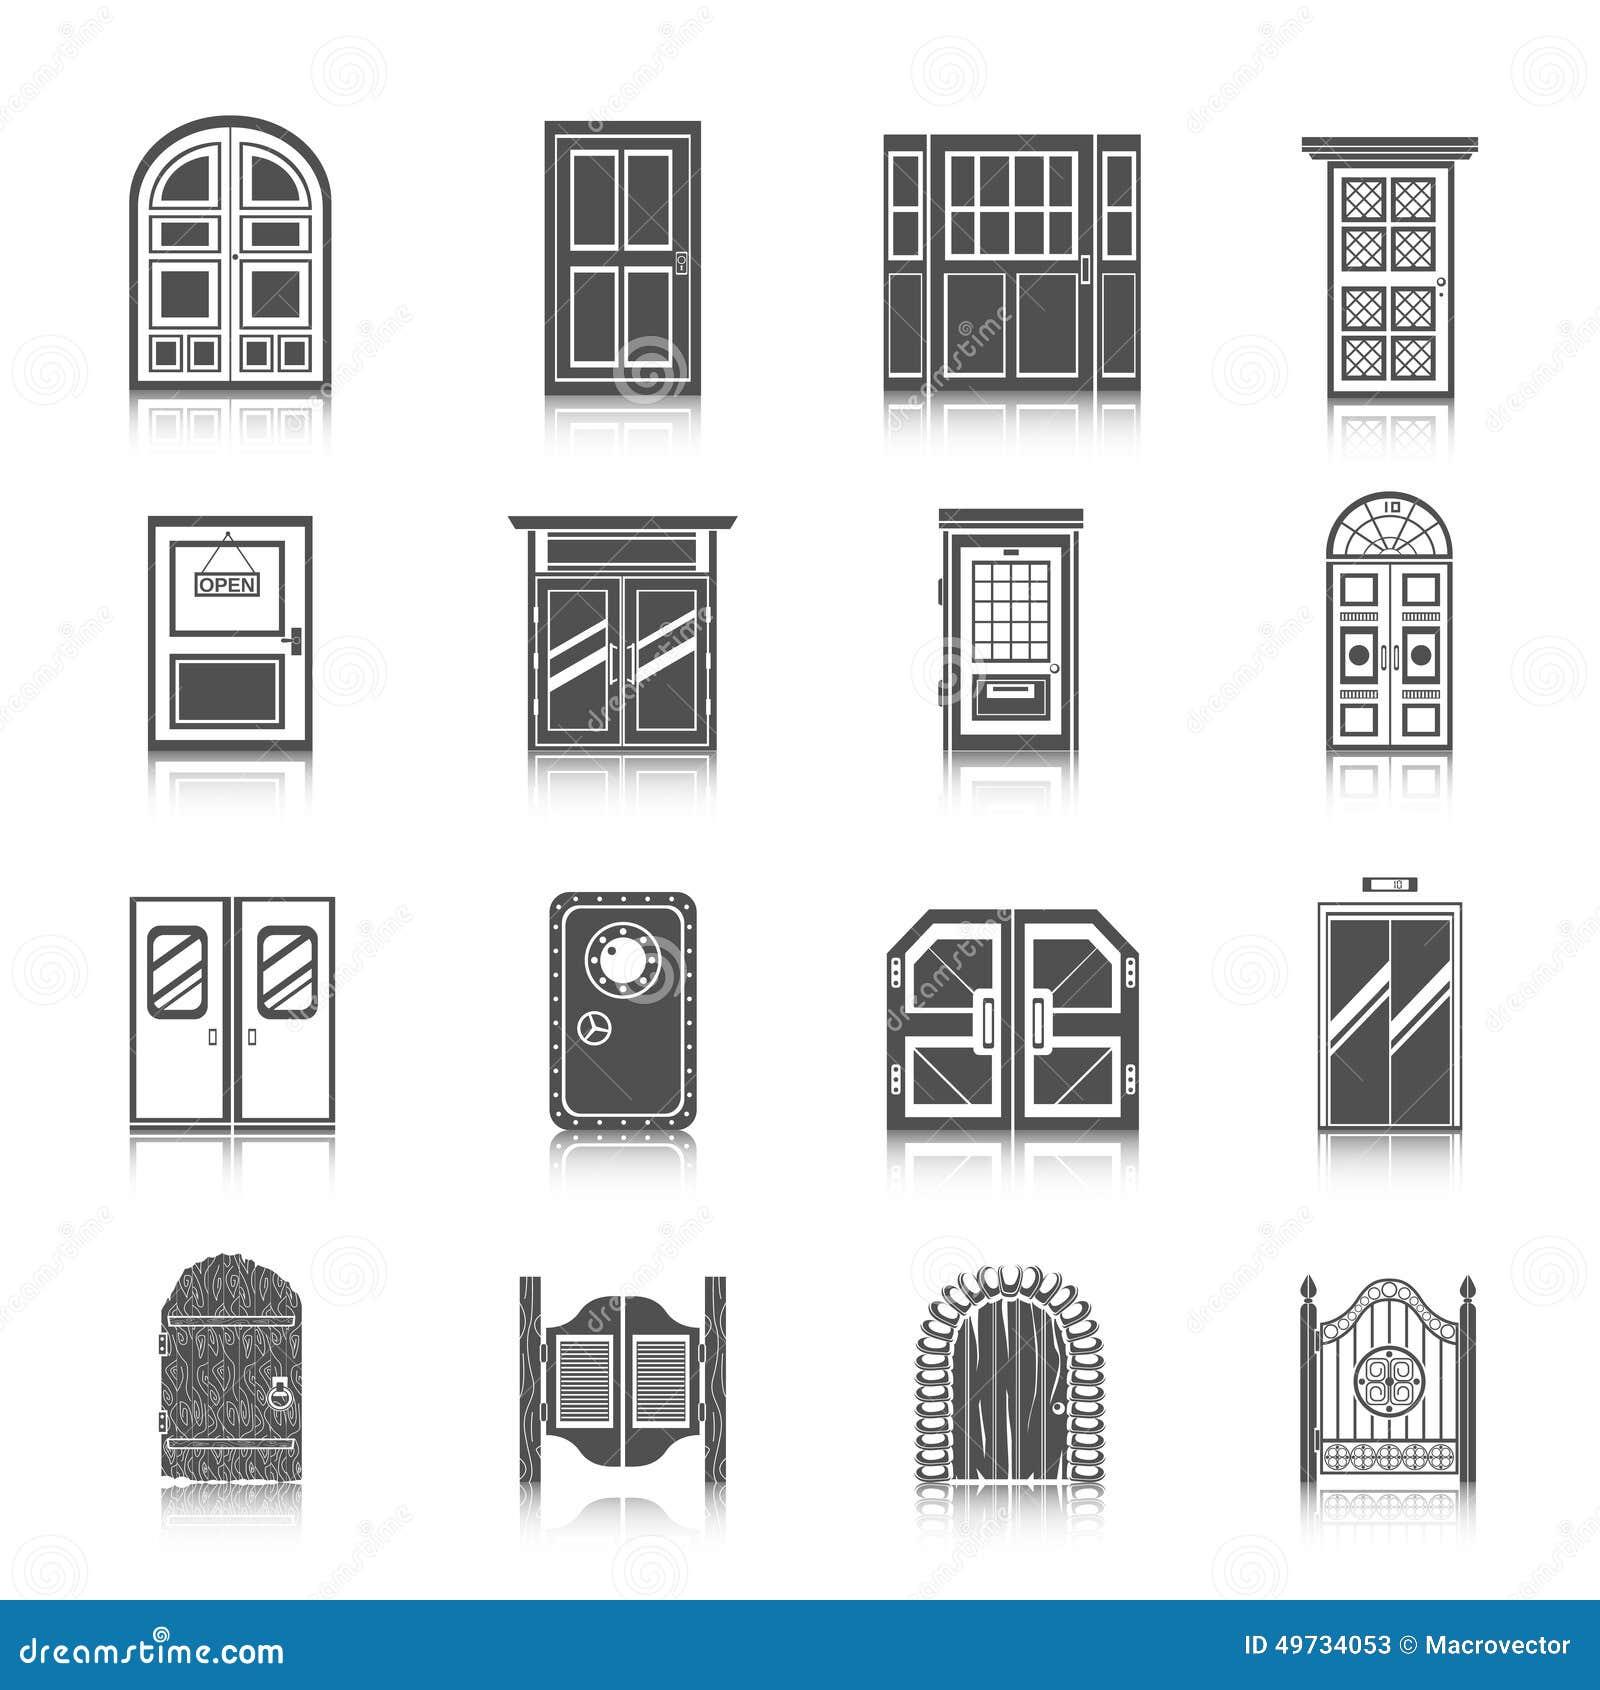 Royalty-Free Vector. Download Door Icons ...  sc 1 st  Dreamstime.com & Door Icons Set Stock Vector - Image: 49734053 pezcame.com